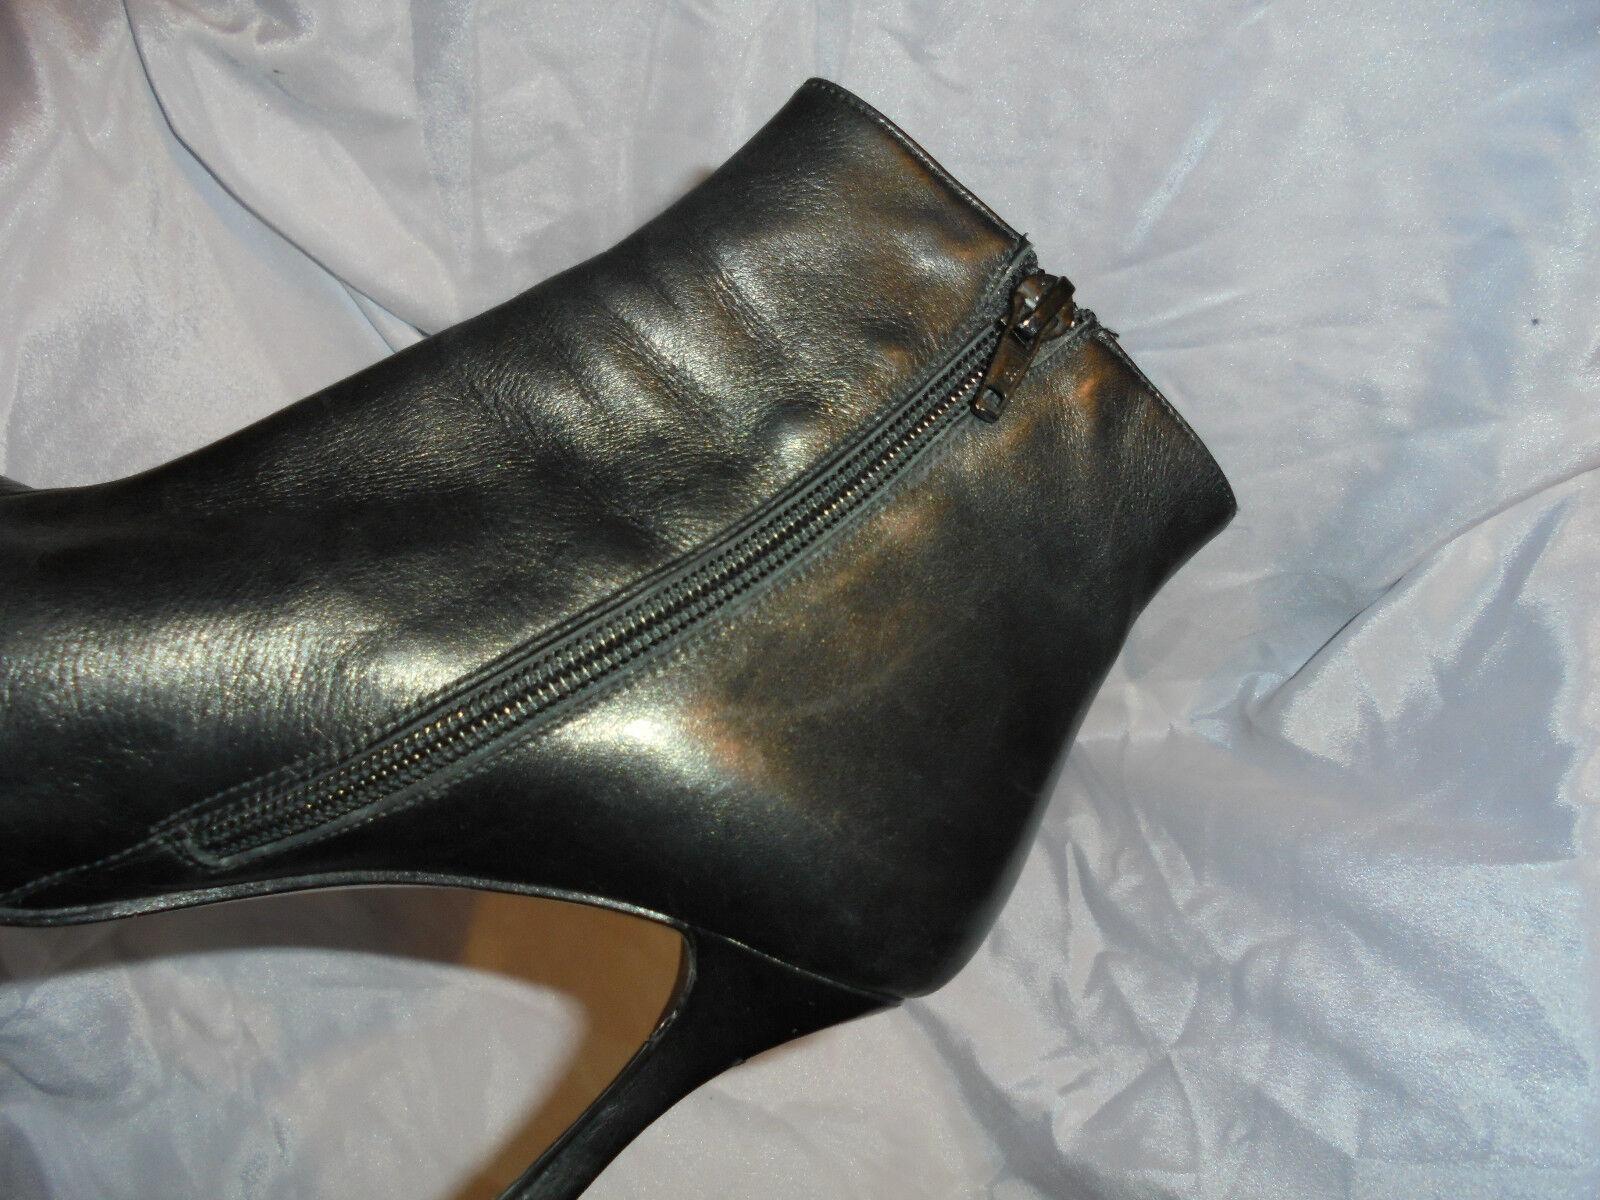 AZUREE WOMEN'S BLACK LEATHER ZIP ANKLE BOOTS SIZE UK 6 EU 39 VGC